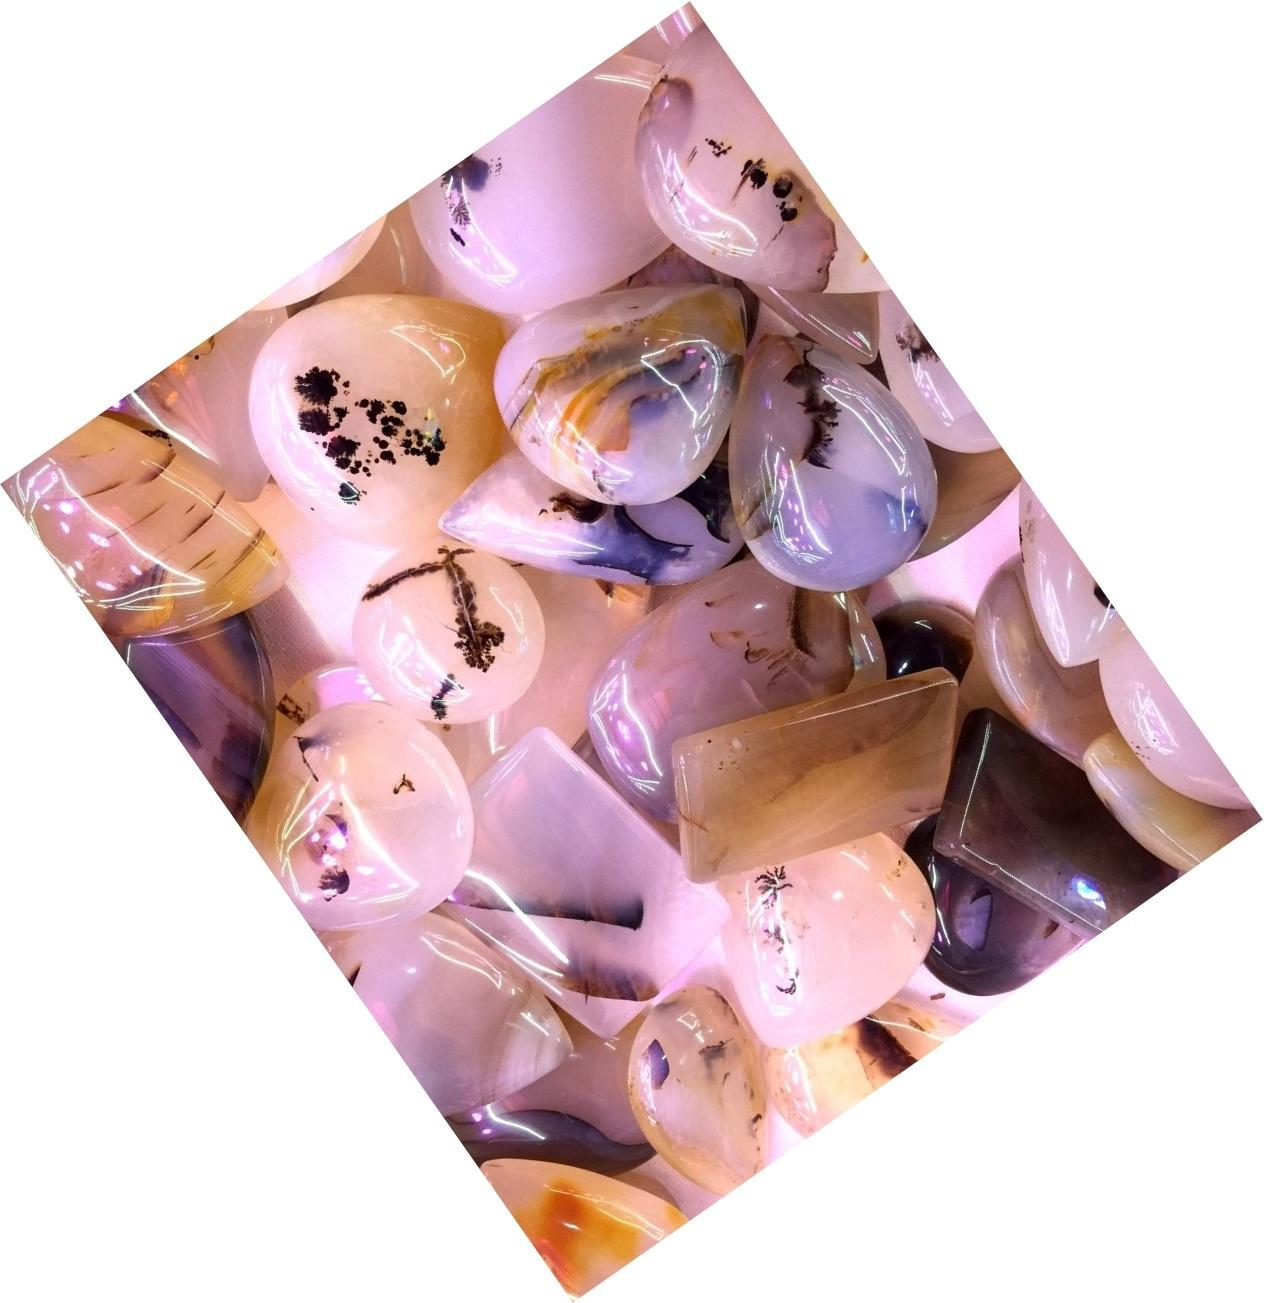 Cherry Blossom Agate Pear Cherry Blossom Agate Flower Agate cabochon loose gemstone